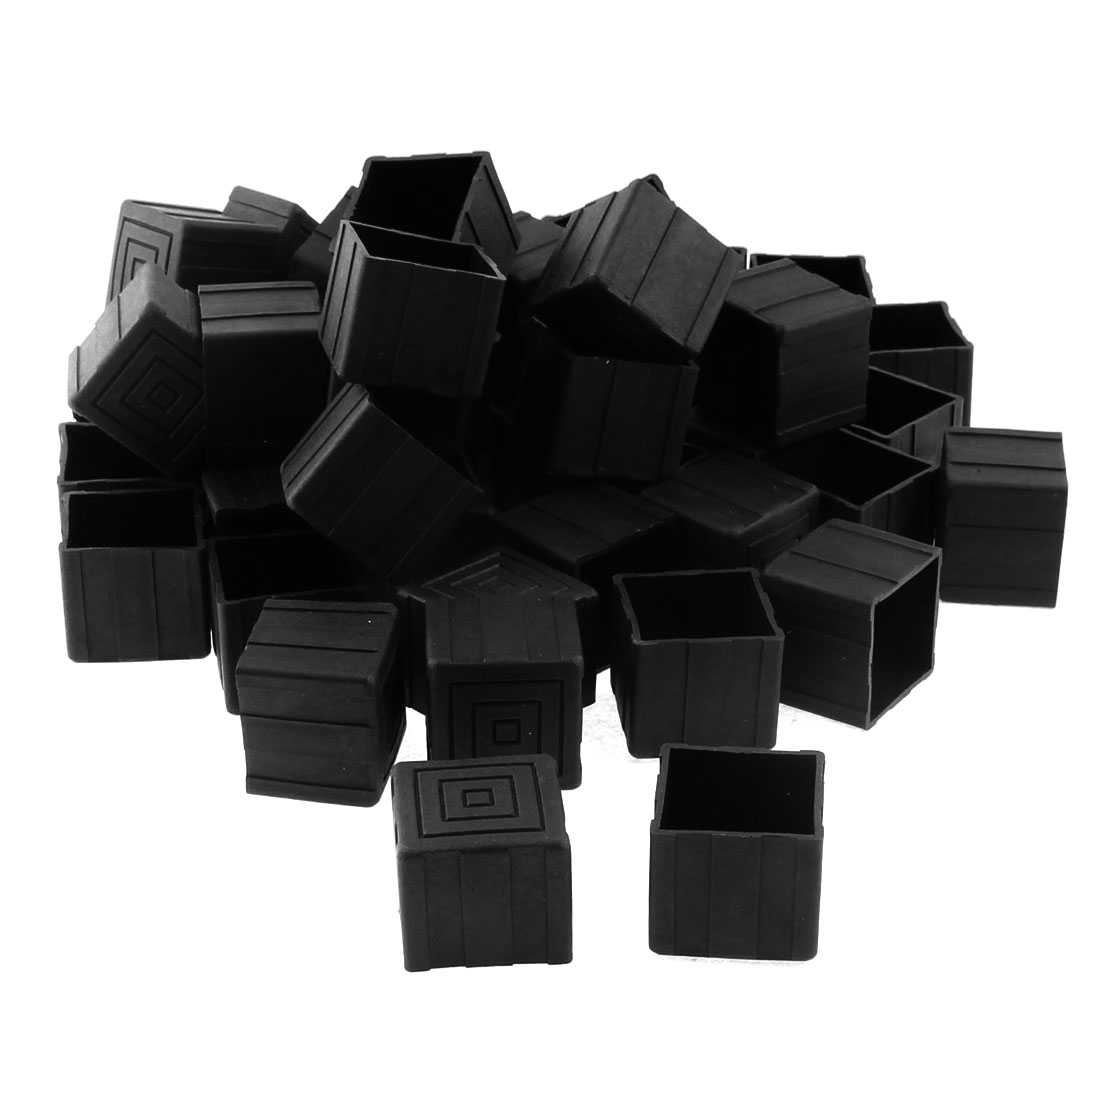 25mm x 25mm Square Shaped Furniture Table Chair Leg Foot Plastic Cover Cap Black 50pcs